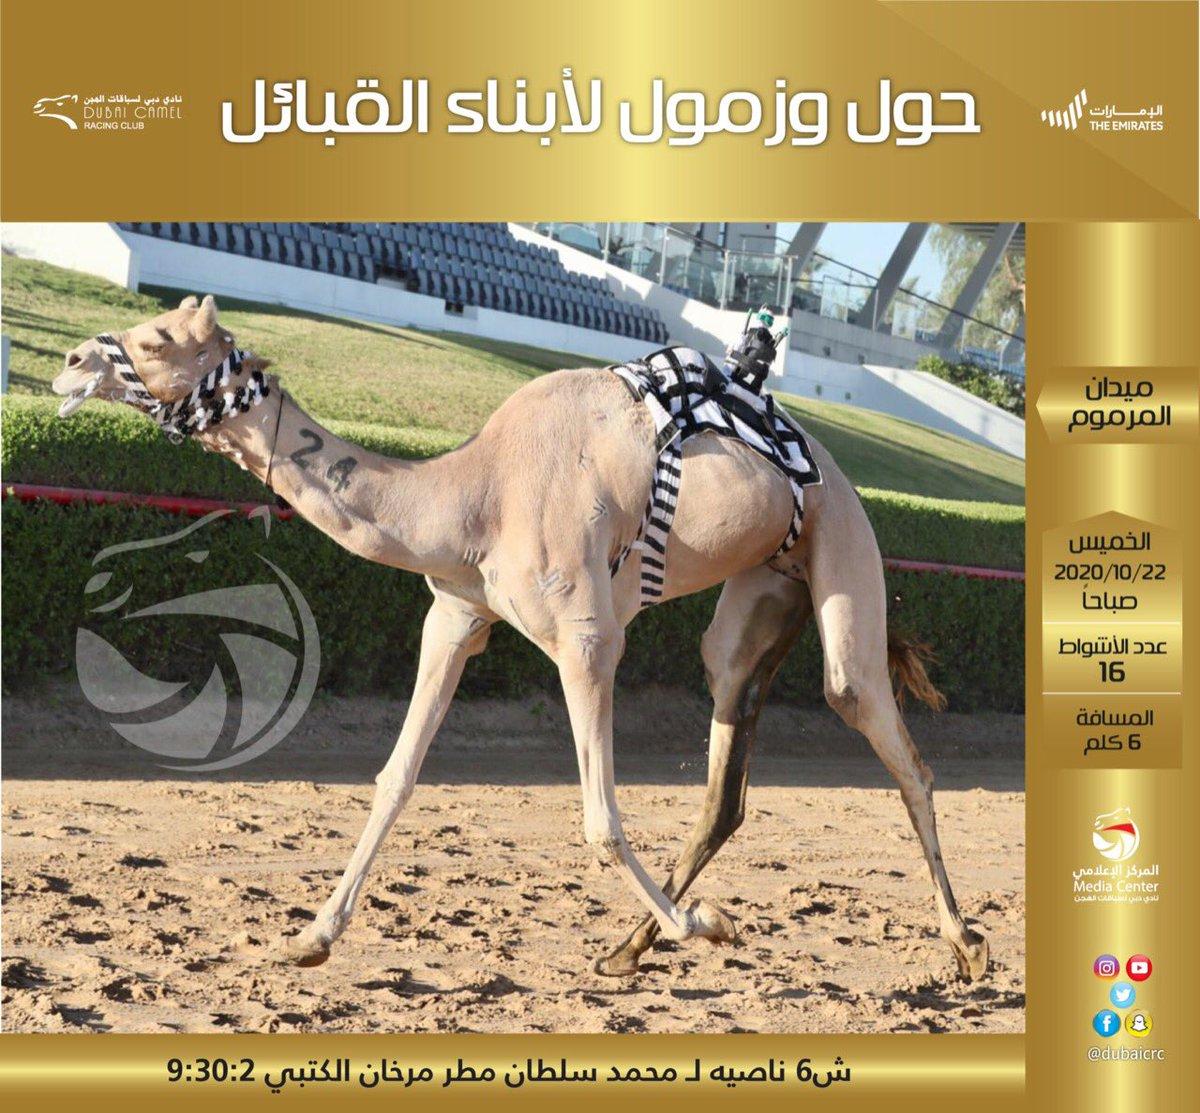 #نادي_دبي_لسباقات_الهجن #المركز_الاعلامي #فزاع #faz3  #almarmoom #Dubaicrc #camel #Racing_club #Dubai #VisitDubai  #uae #Camelrace #sports #fun #camels #heritage #race #tourism #emirates #photography #dubailife #DCRC #mydubai https://t.co/Q07uWF6zxG